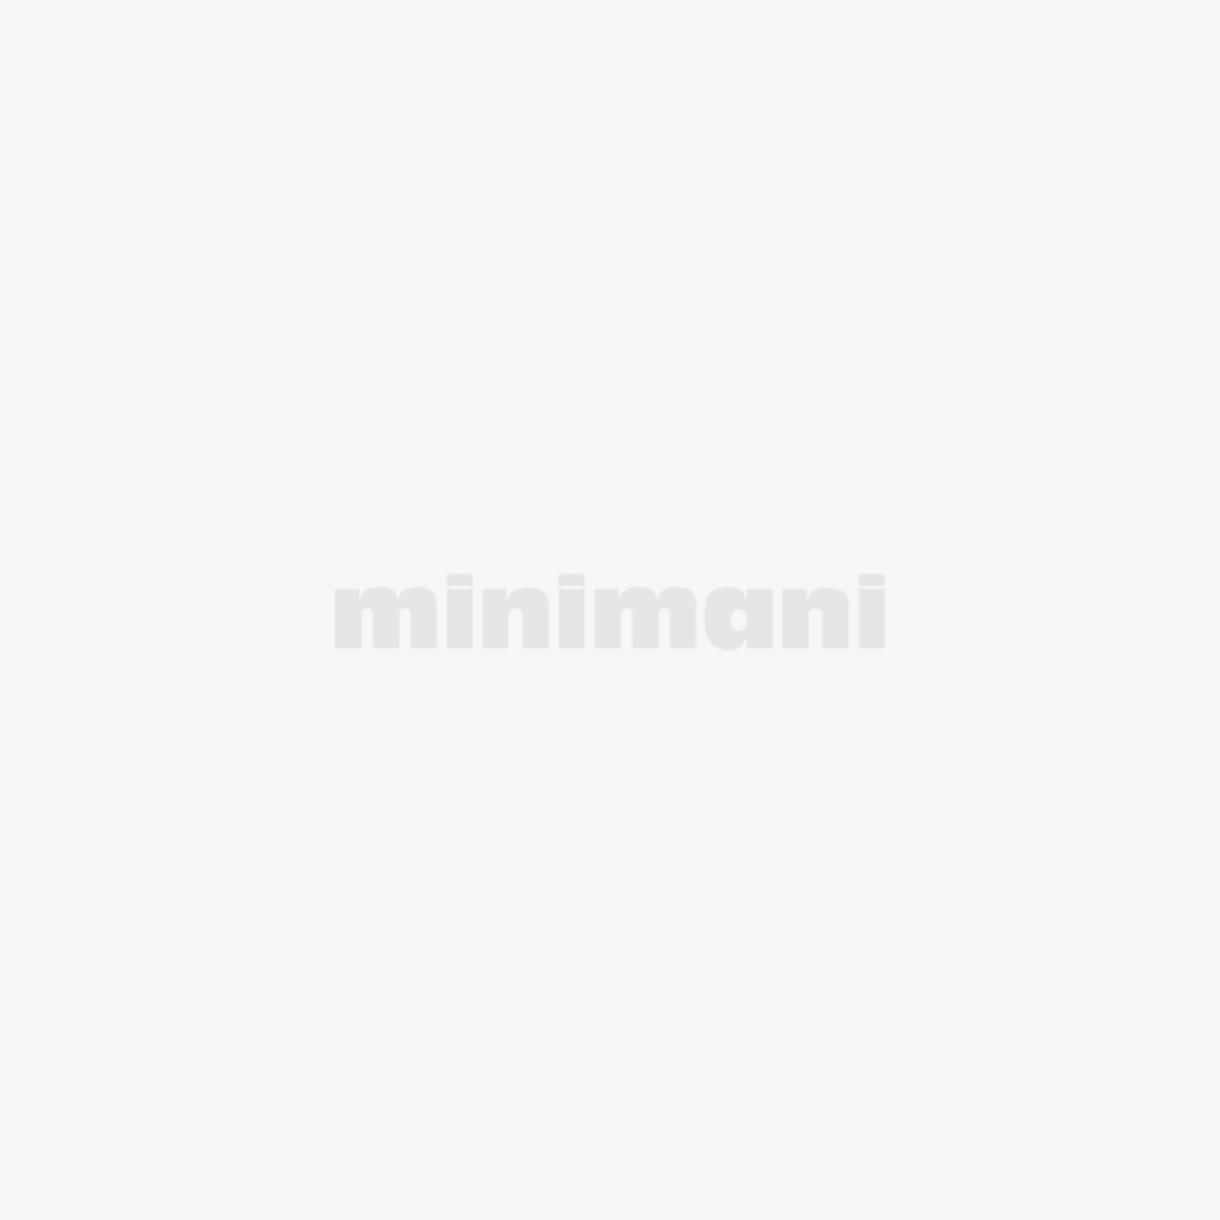 M-FILTER RAITISILMASUODATIN MAC 8014 C70,S60,S70,S80,V70